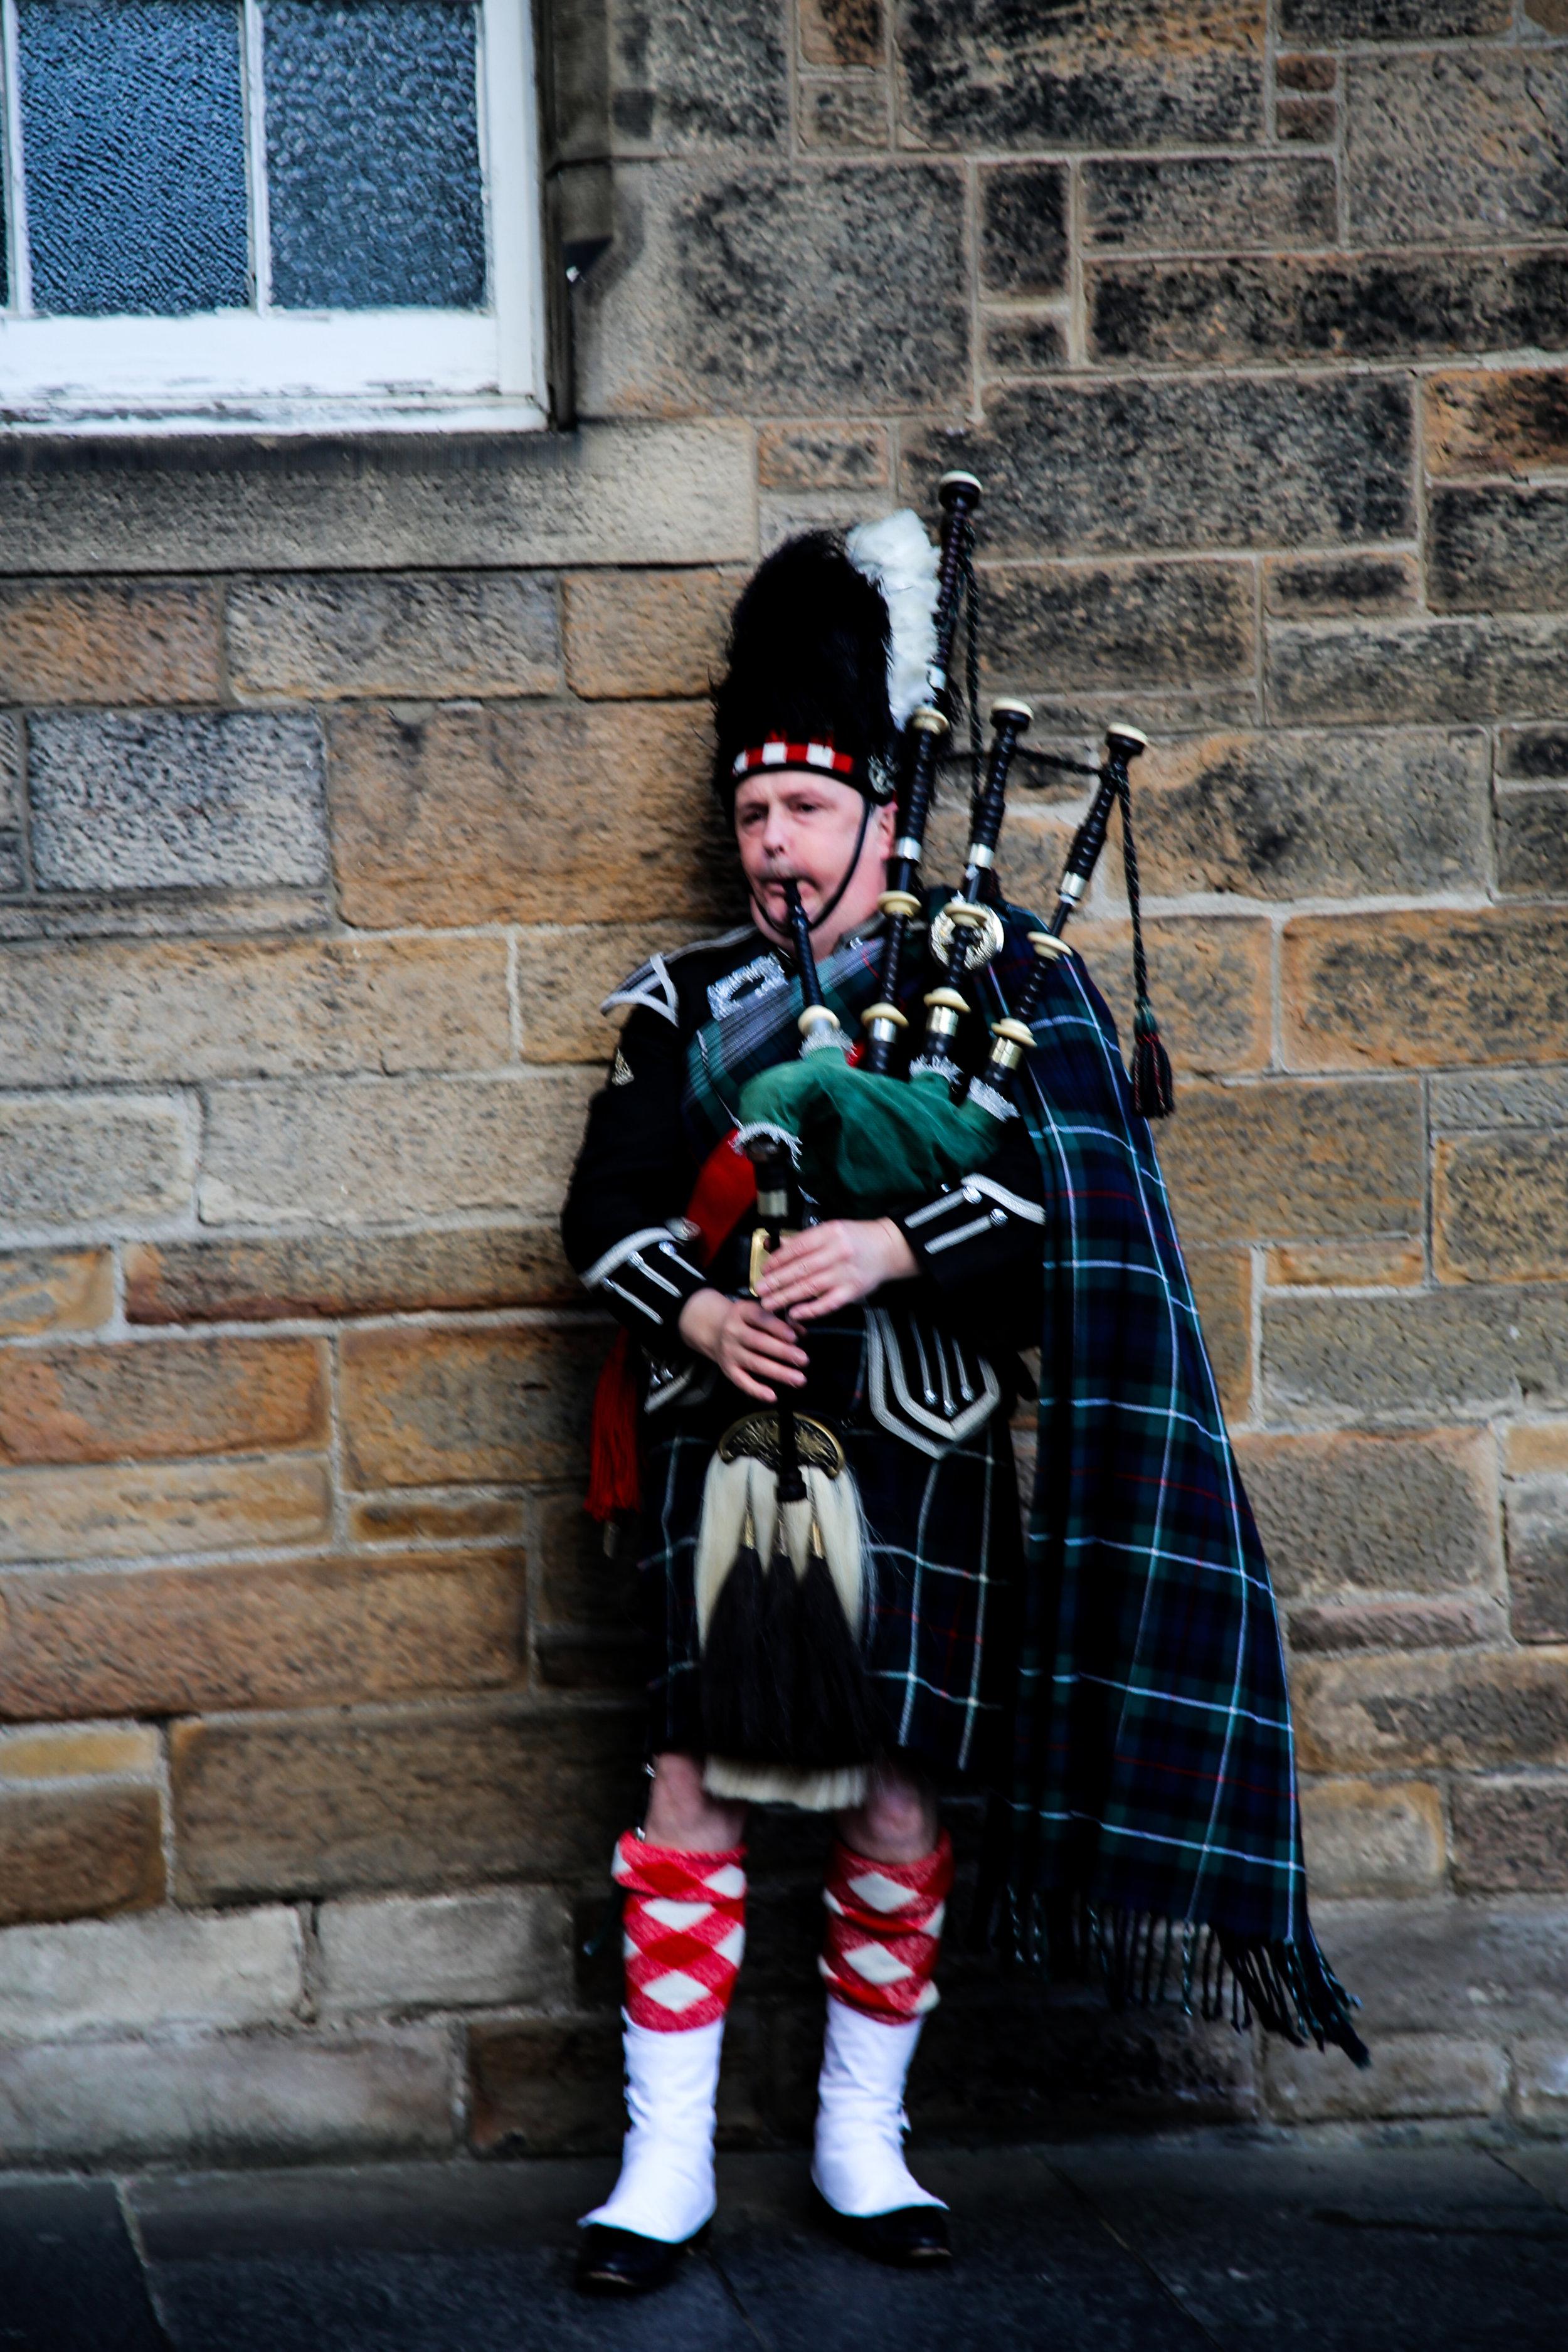 Scottish highlander playing bagpipes Edinburgh